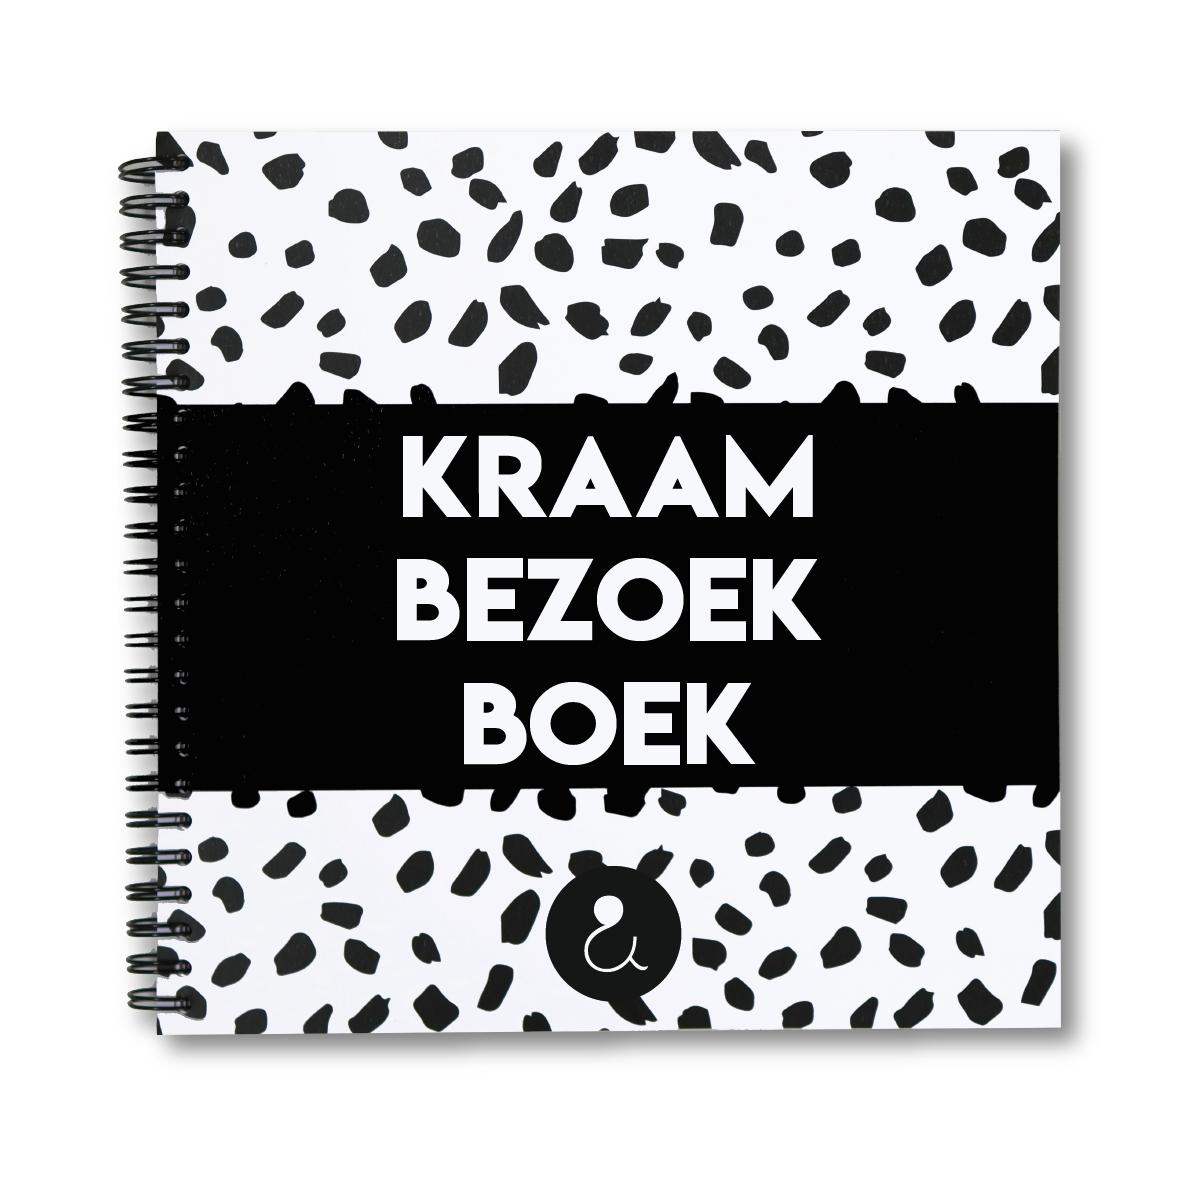 Kraambezoekboek | monochrome